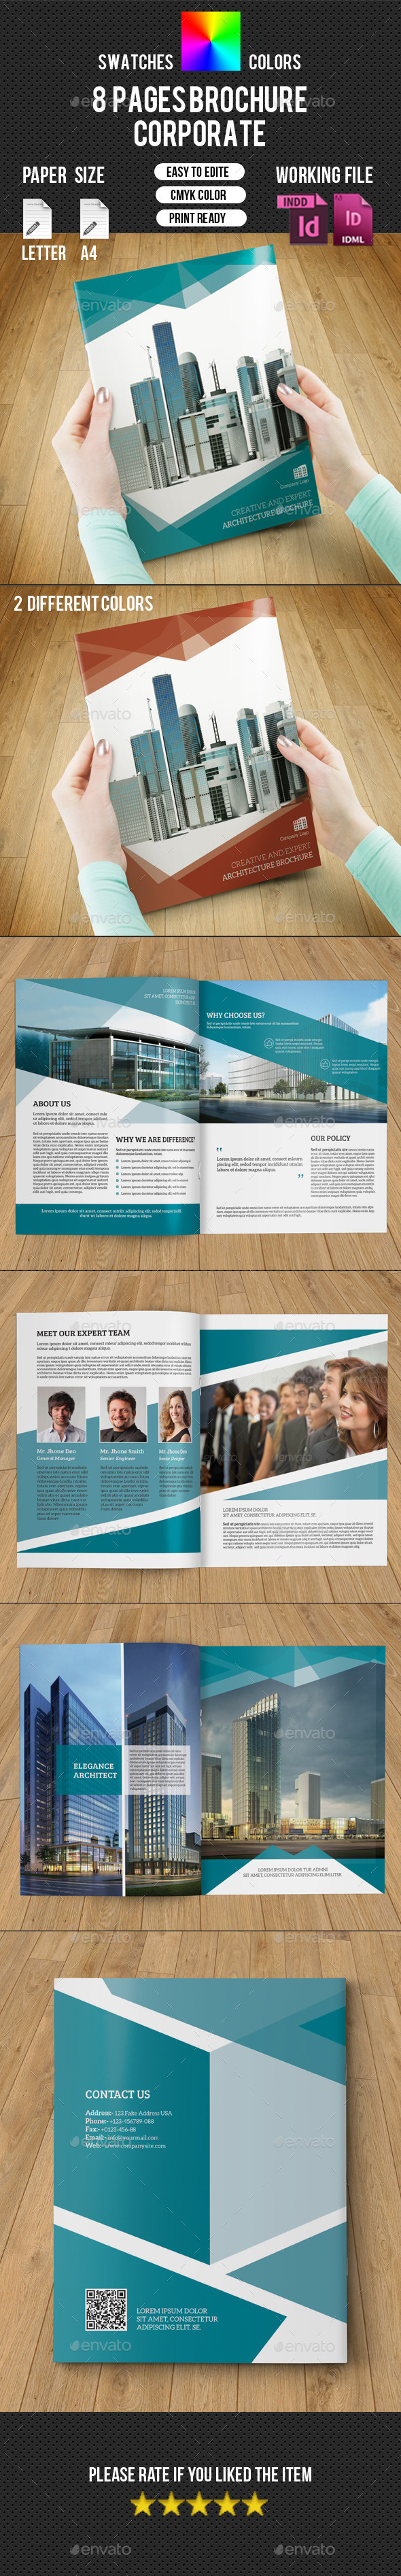 Corporate Brochure-V201 - Corporate Brochures